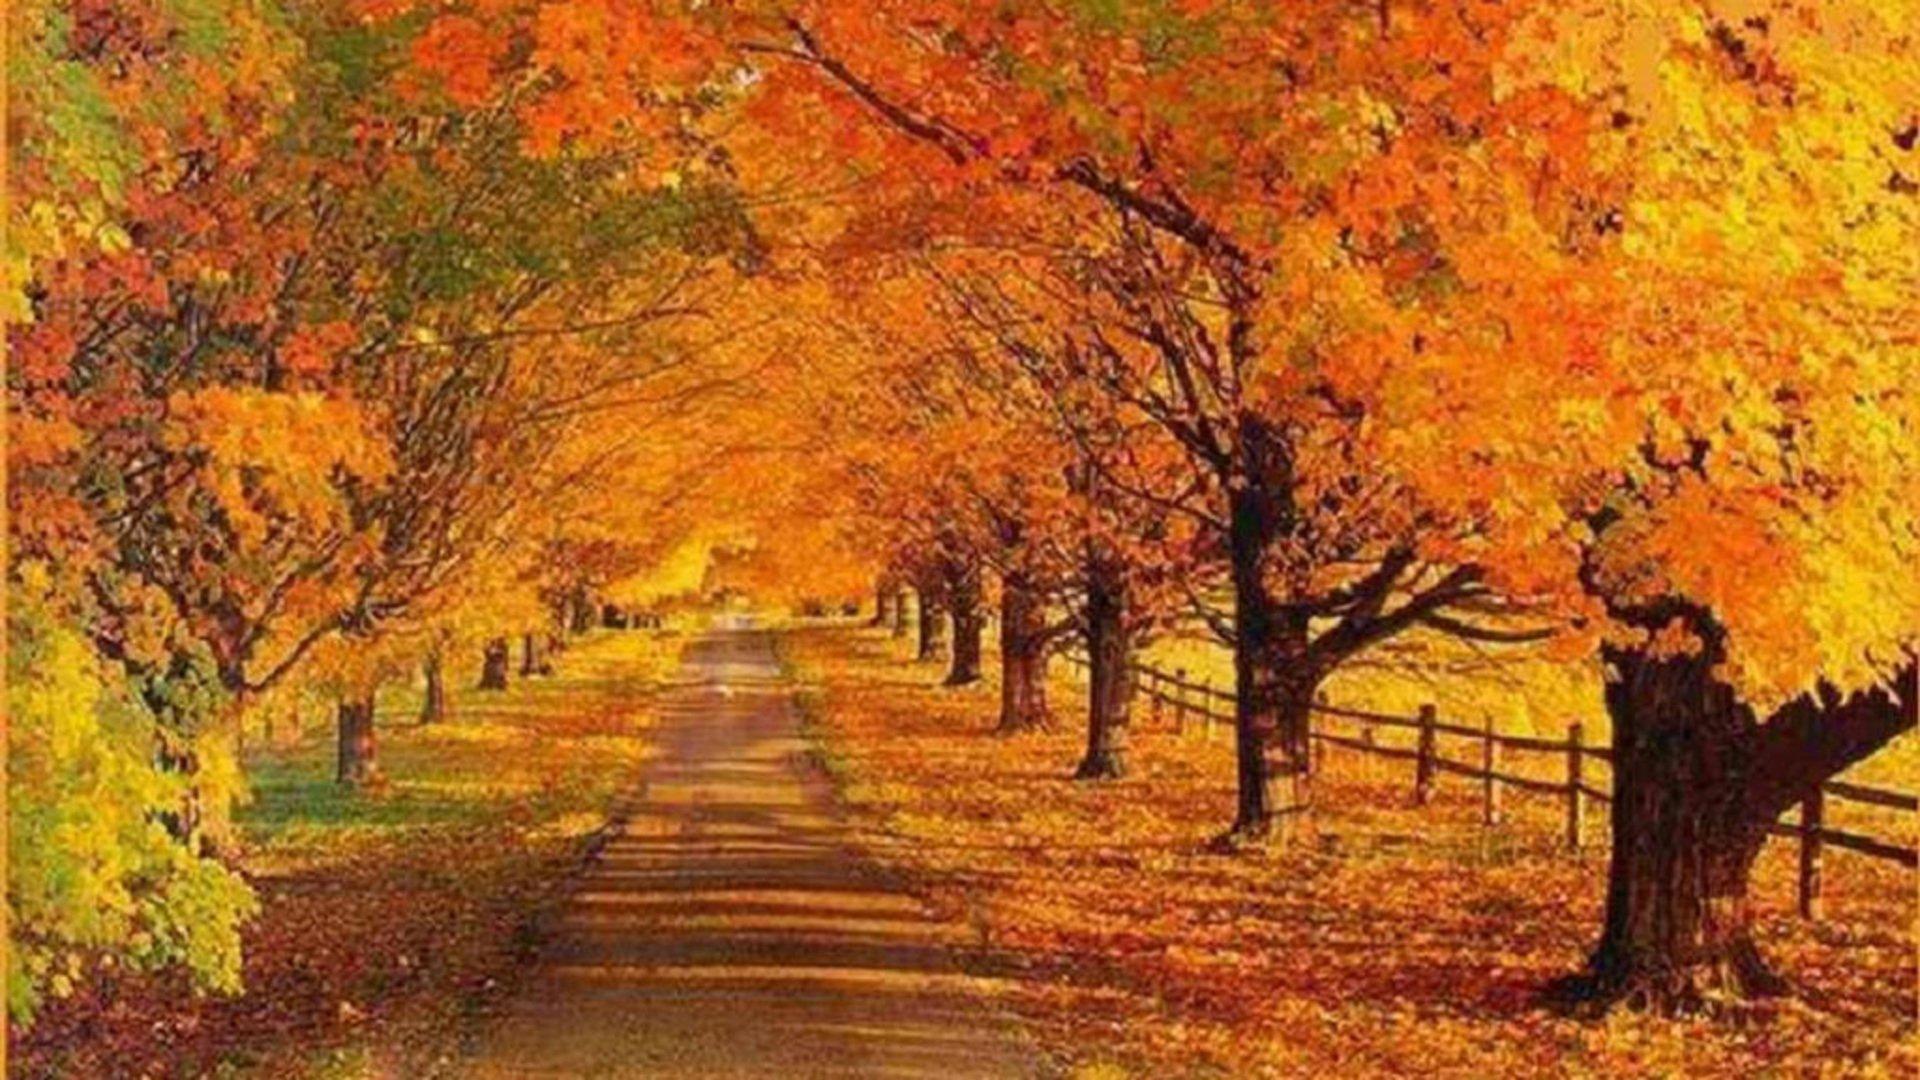 32 autumn scenes wallpaper landscapes on wallpapersafari - Pics of fall scenes ...